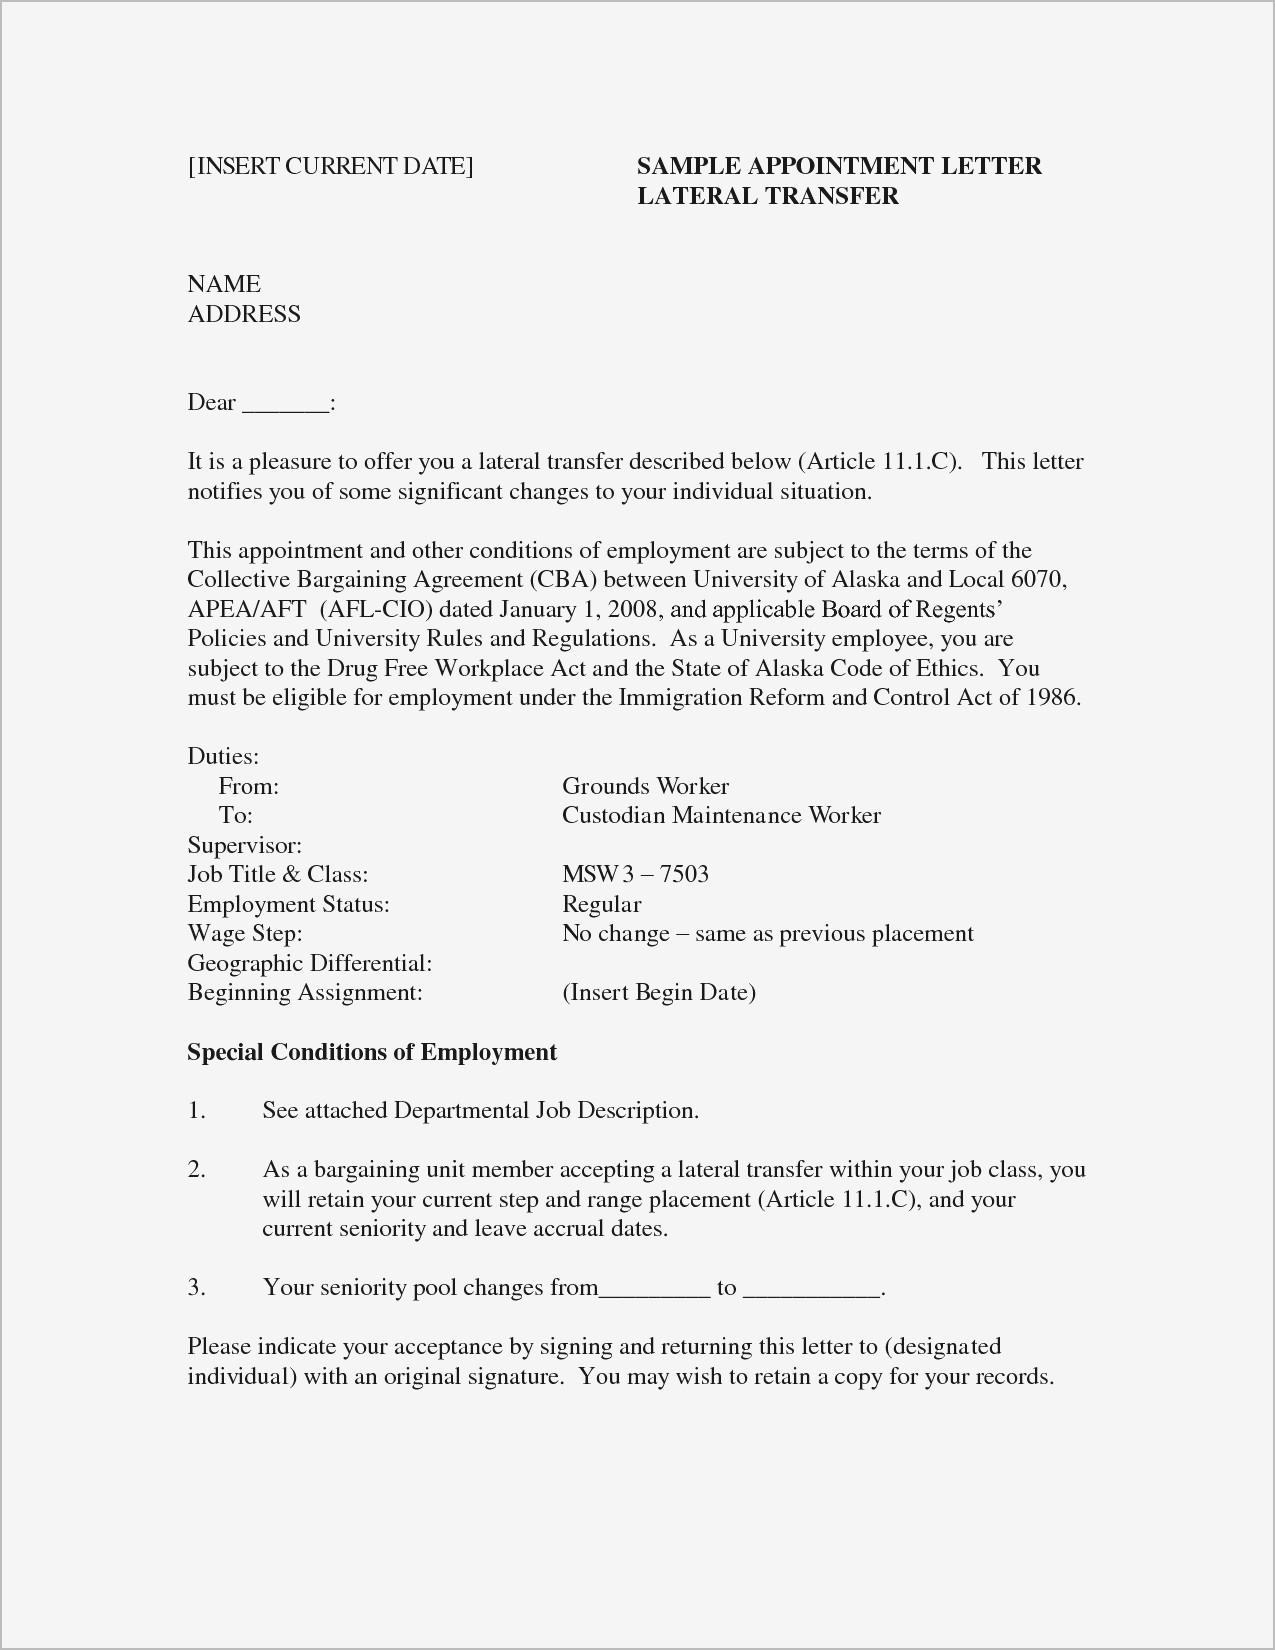 Sample Cover Letter Template - Sample Cover Letter for Job Fer Refrence Job Fer Letter Template